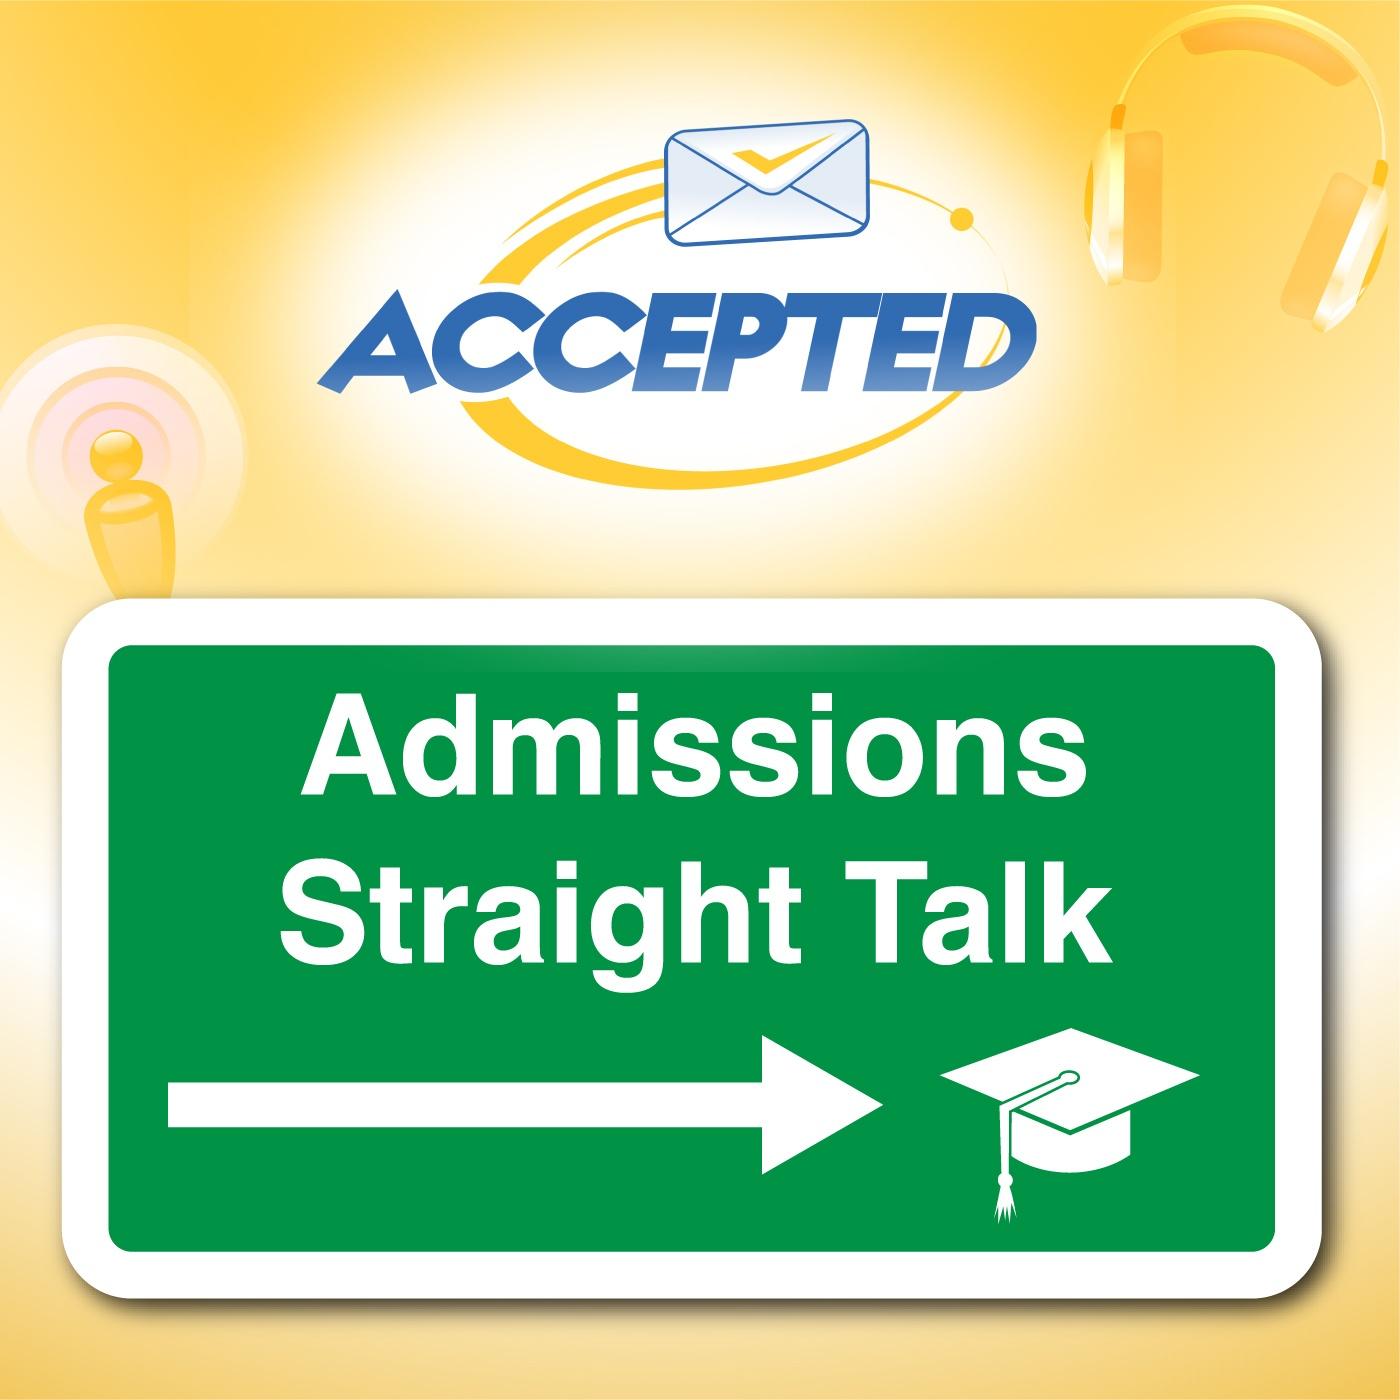 Admissions Straight Talk